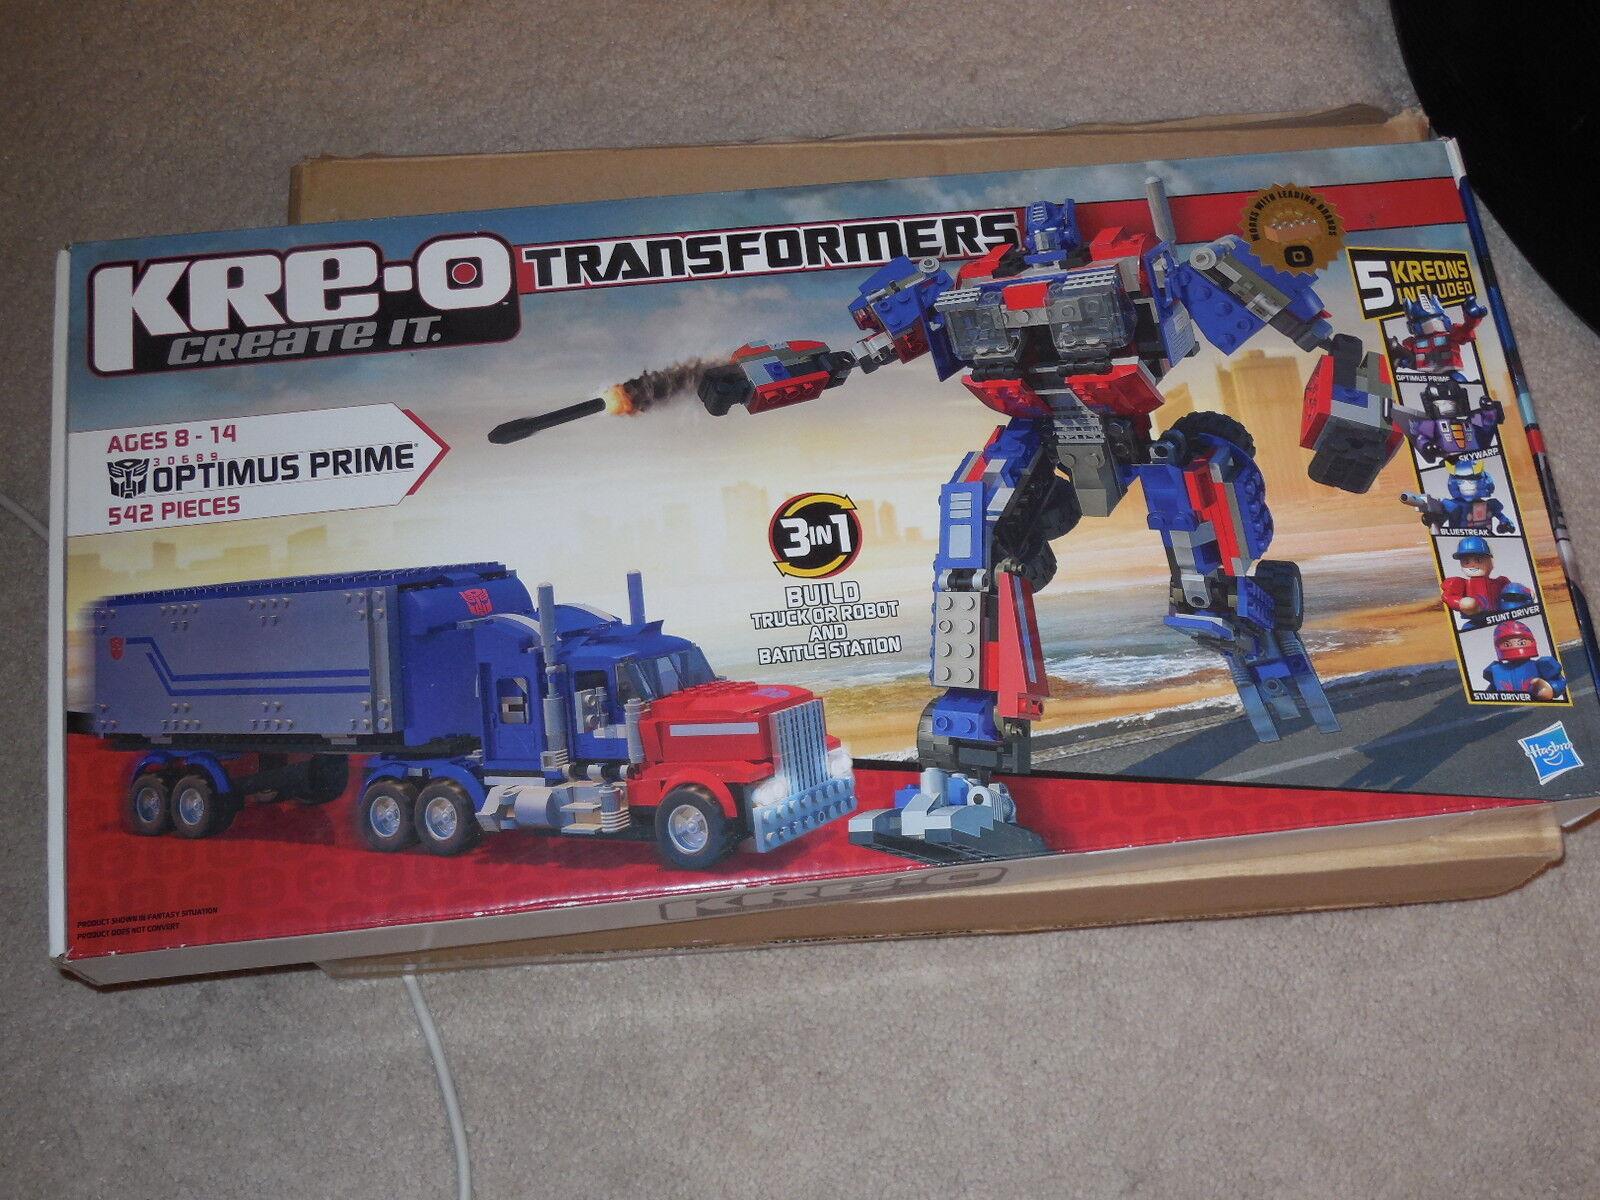 Transformers kre-o optimus prime 542 pieces brand new never opened fast ship NIB